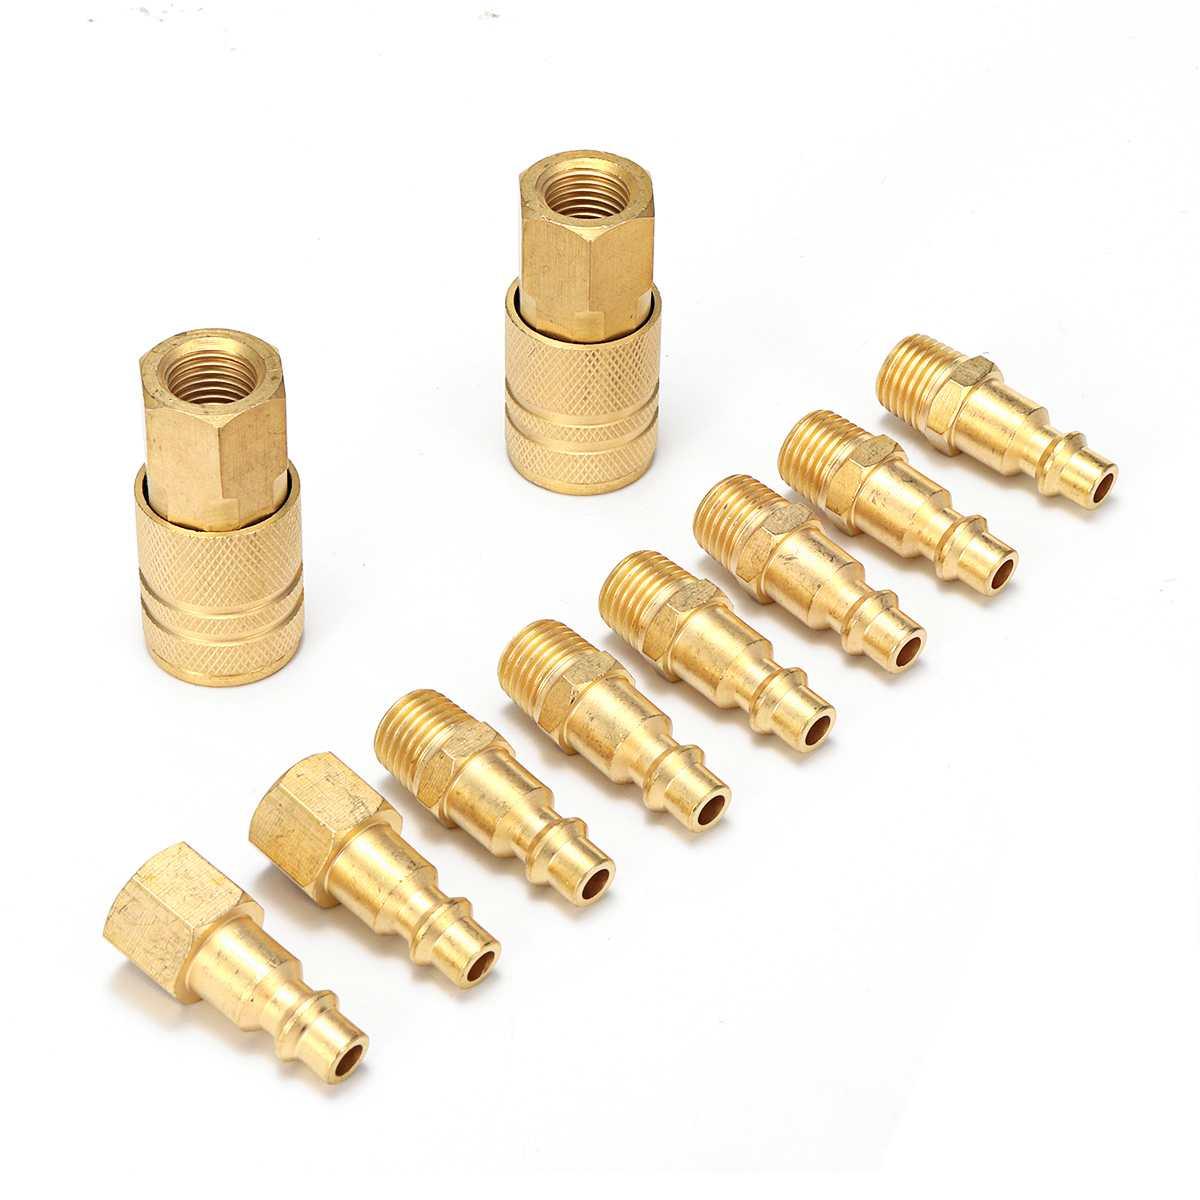 10pcs Fitting Air Compressor Hose Quick Couple Air Line Hose Coupling Adapter Connector Quick Coupler 1/4